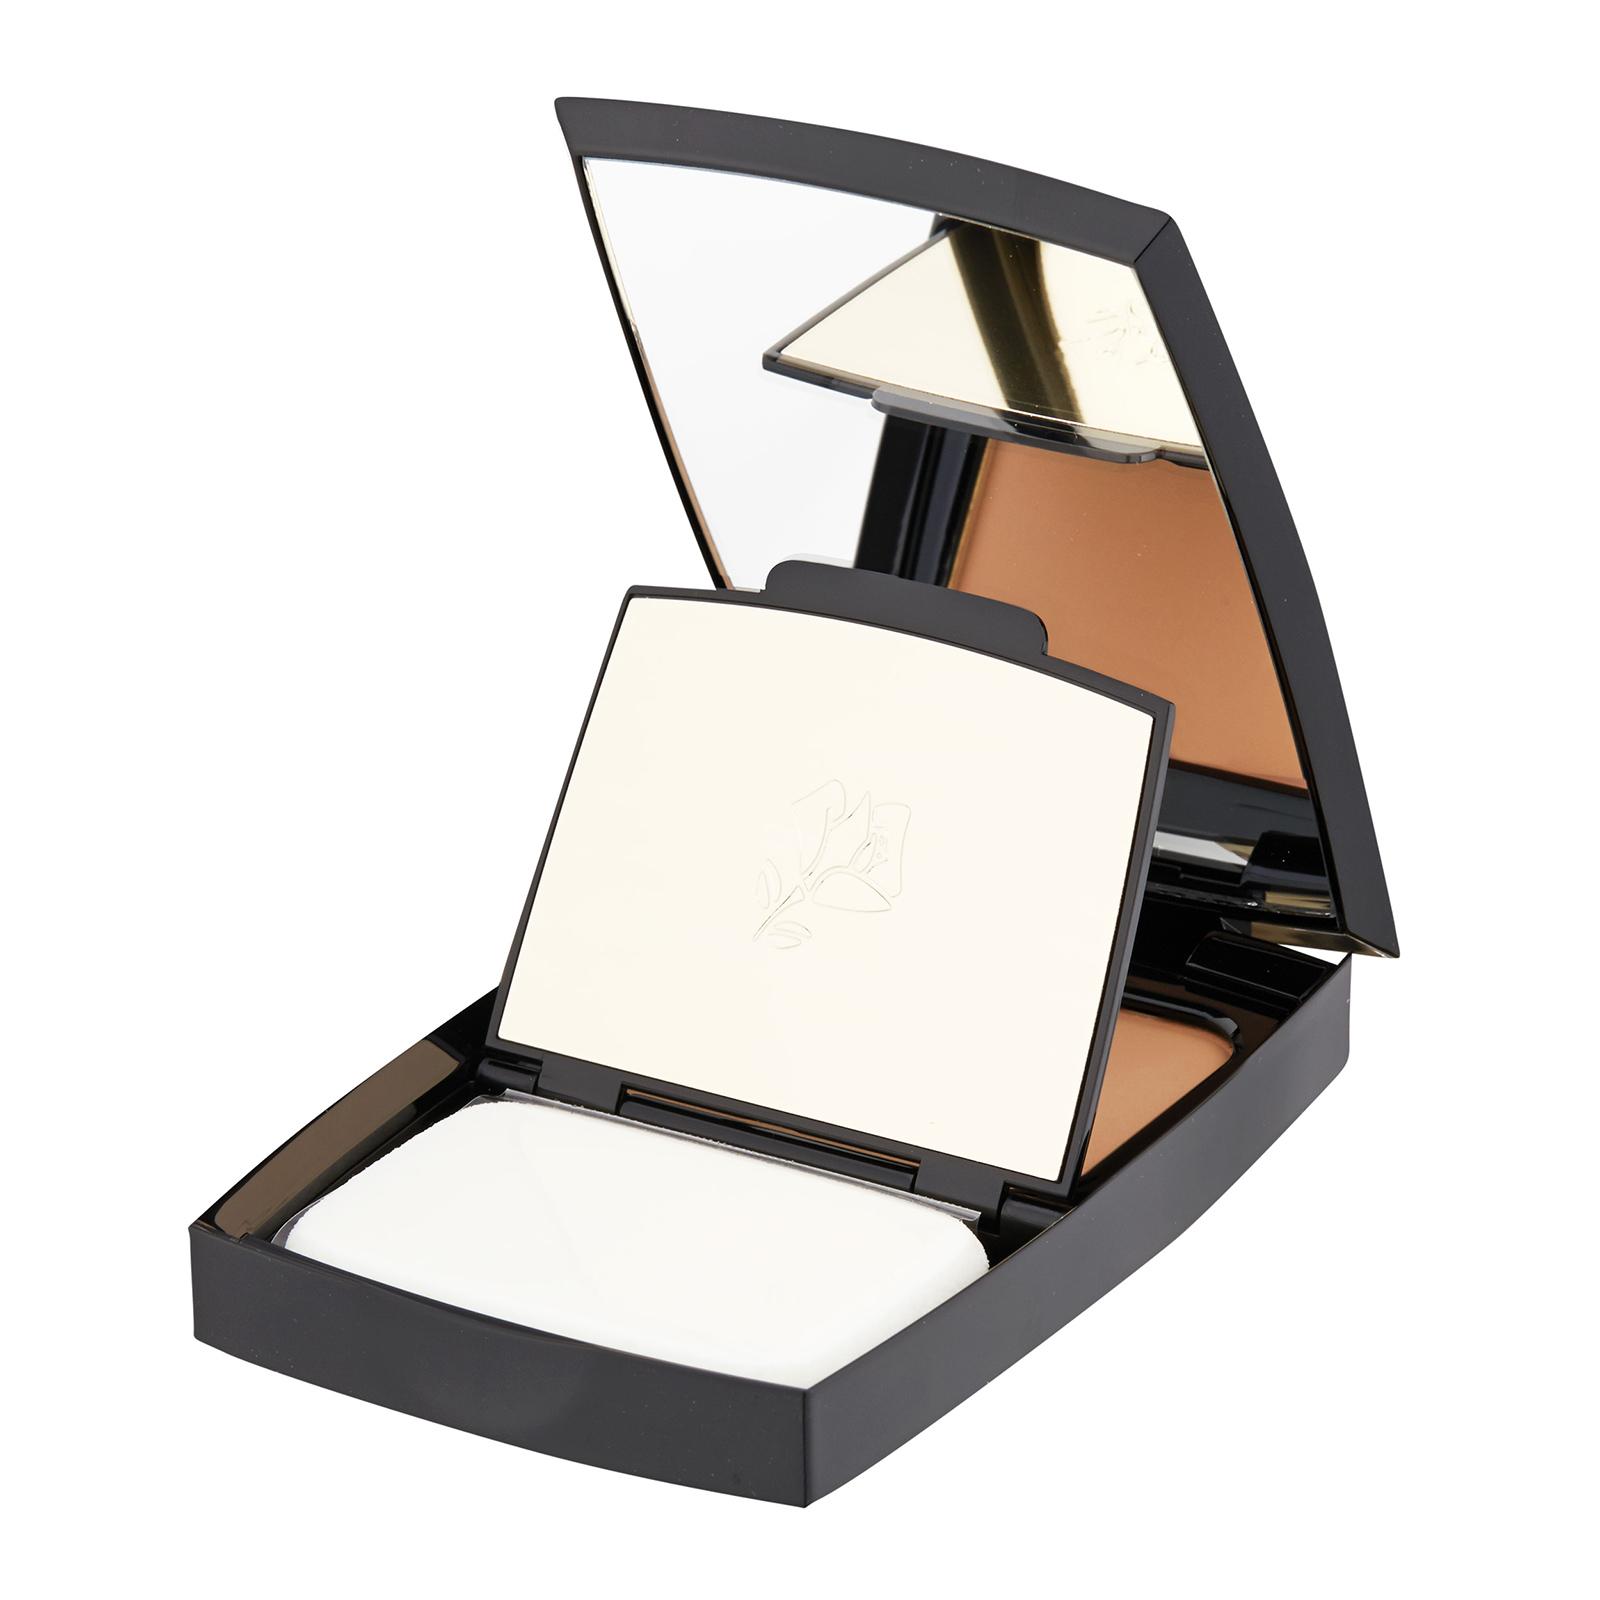 LANCÔME Teint Idole Ultra  Compact Powder Foundation Long-Wear Matte Finish Retouch-Free Shine Control 03 Beige Diaphane, 0.38oz, 11g